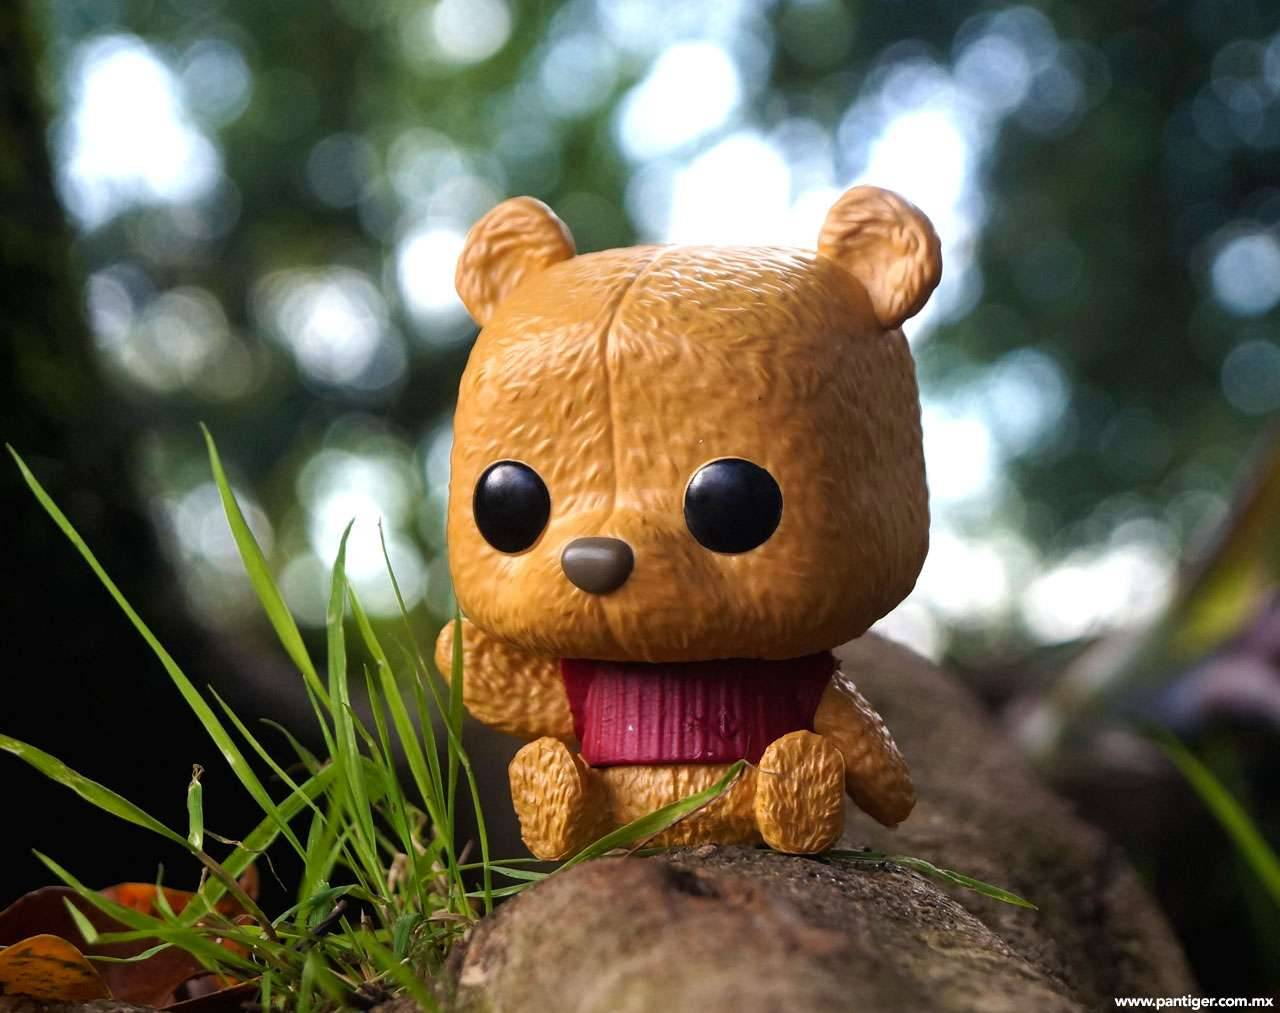 Winnie the Pooh (Christopher Robin) Pop! Vinyl